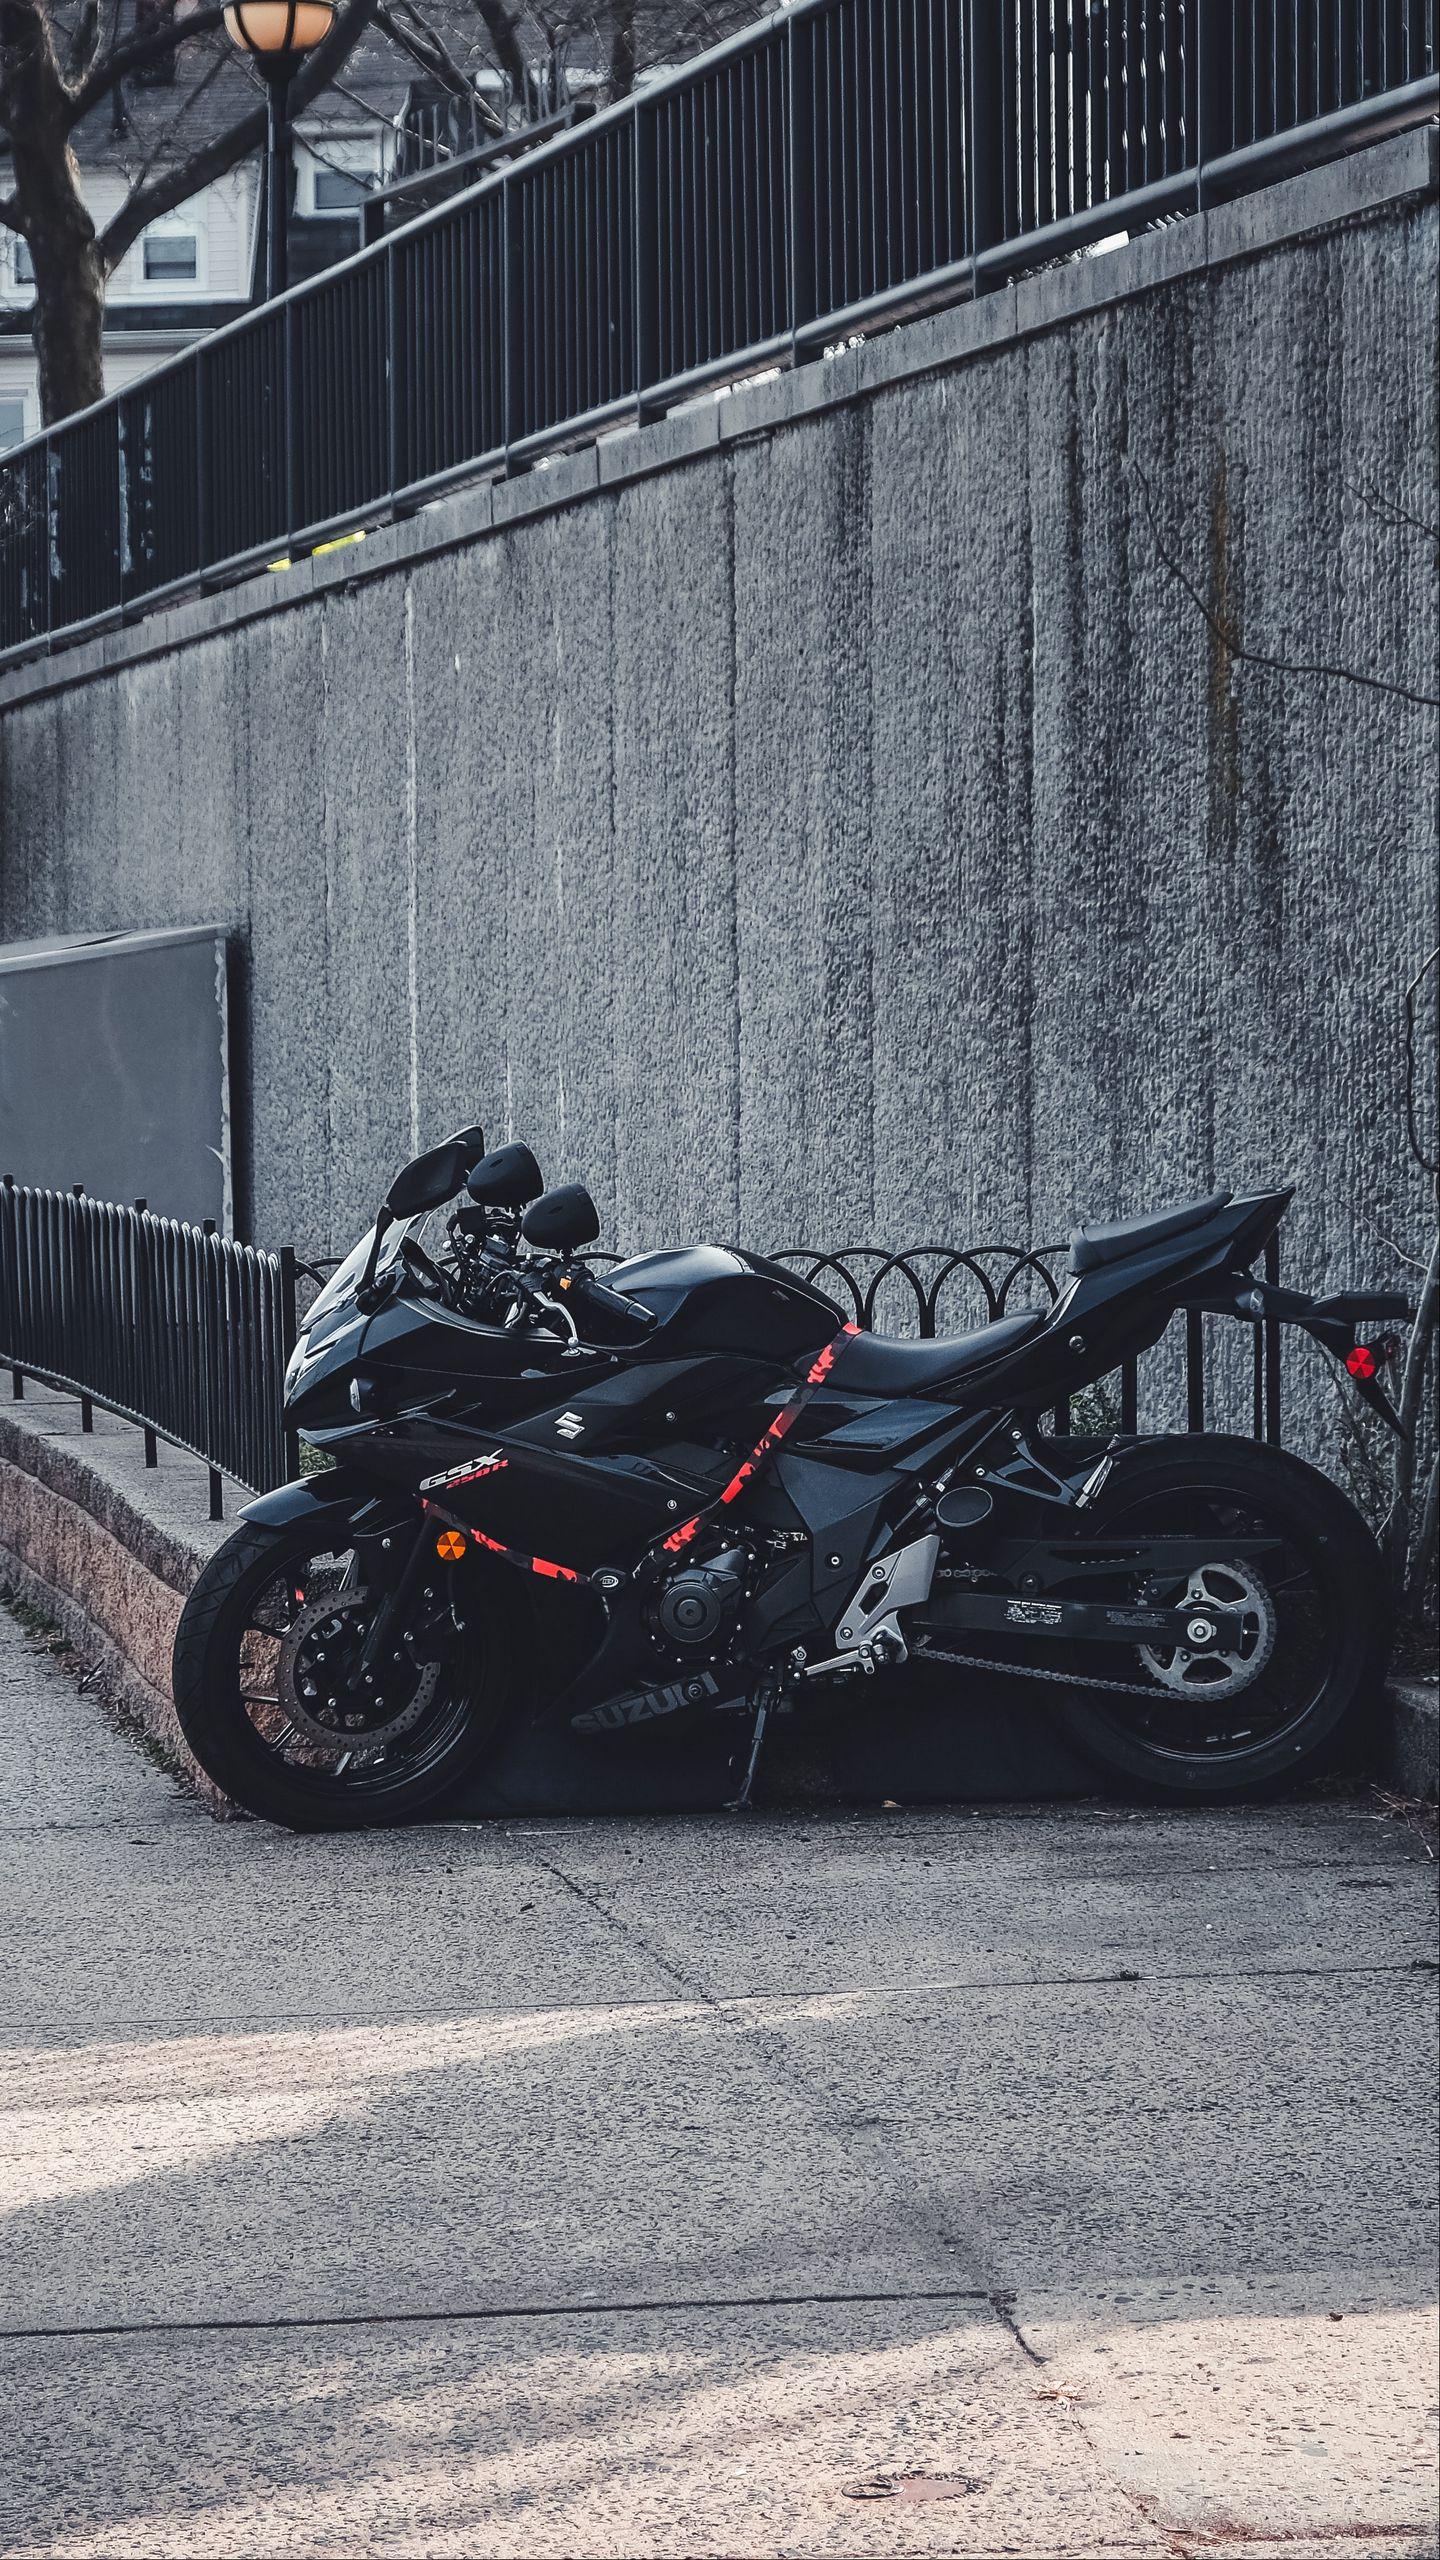 1440x2560 Wallpaper suzuki, motorcycle, bike, black, parking